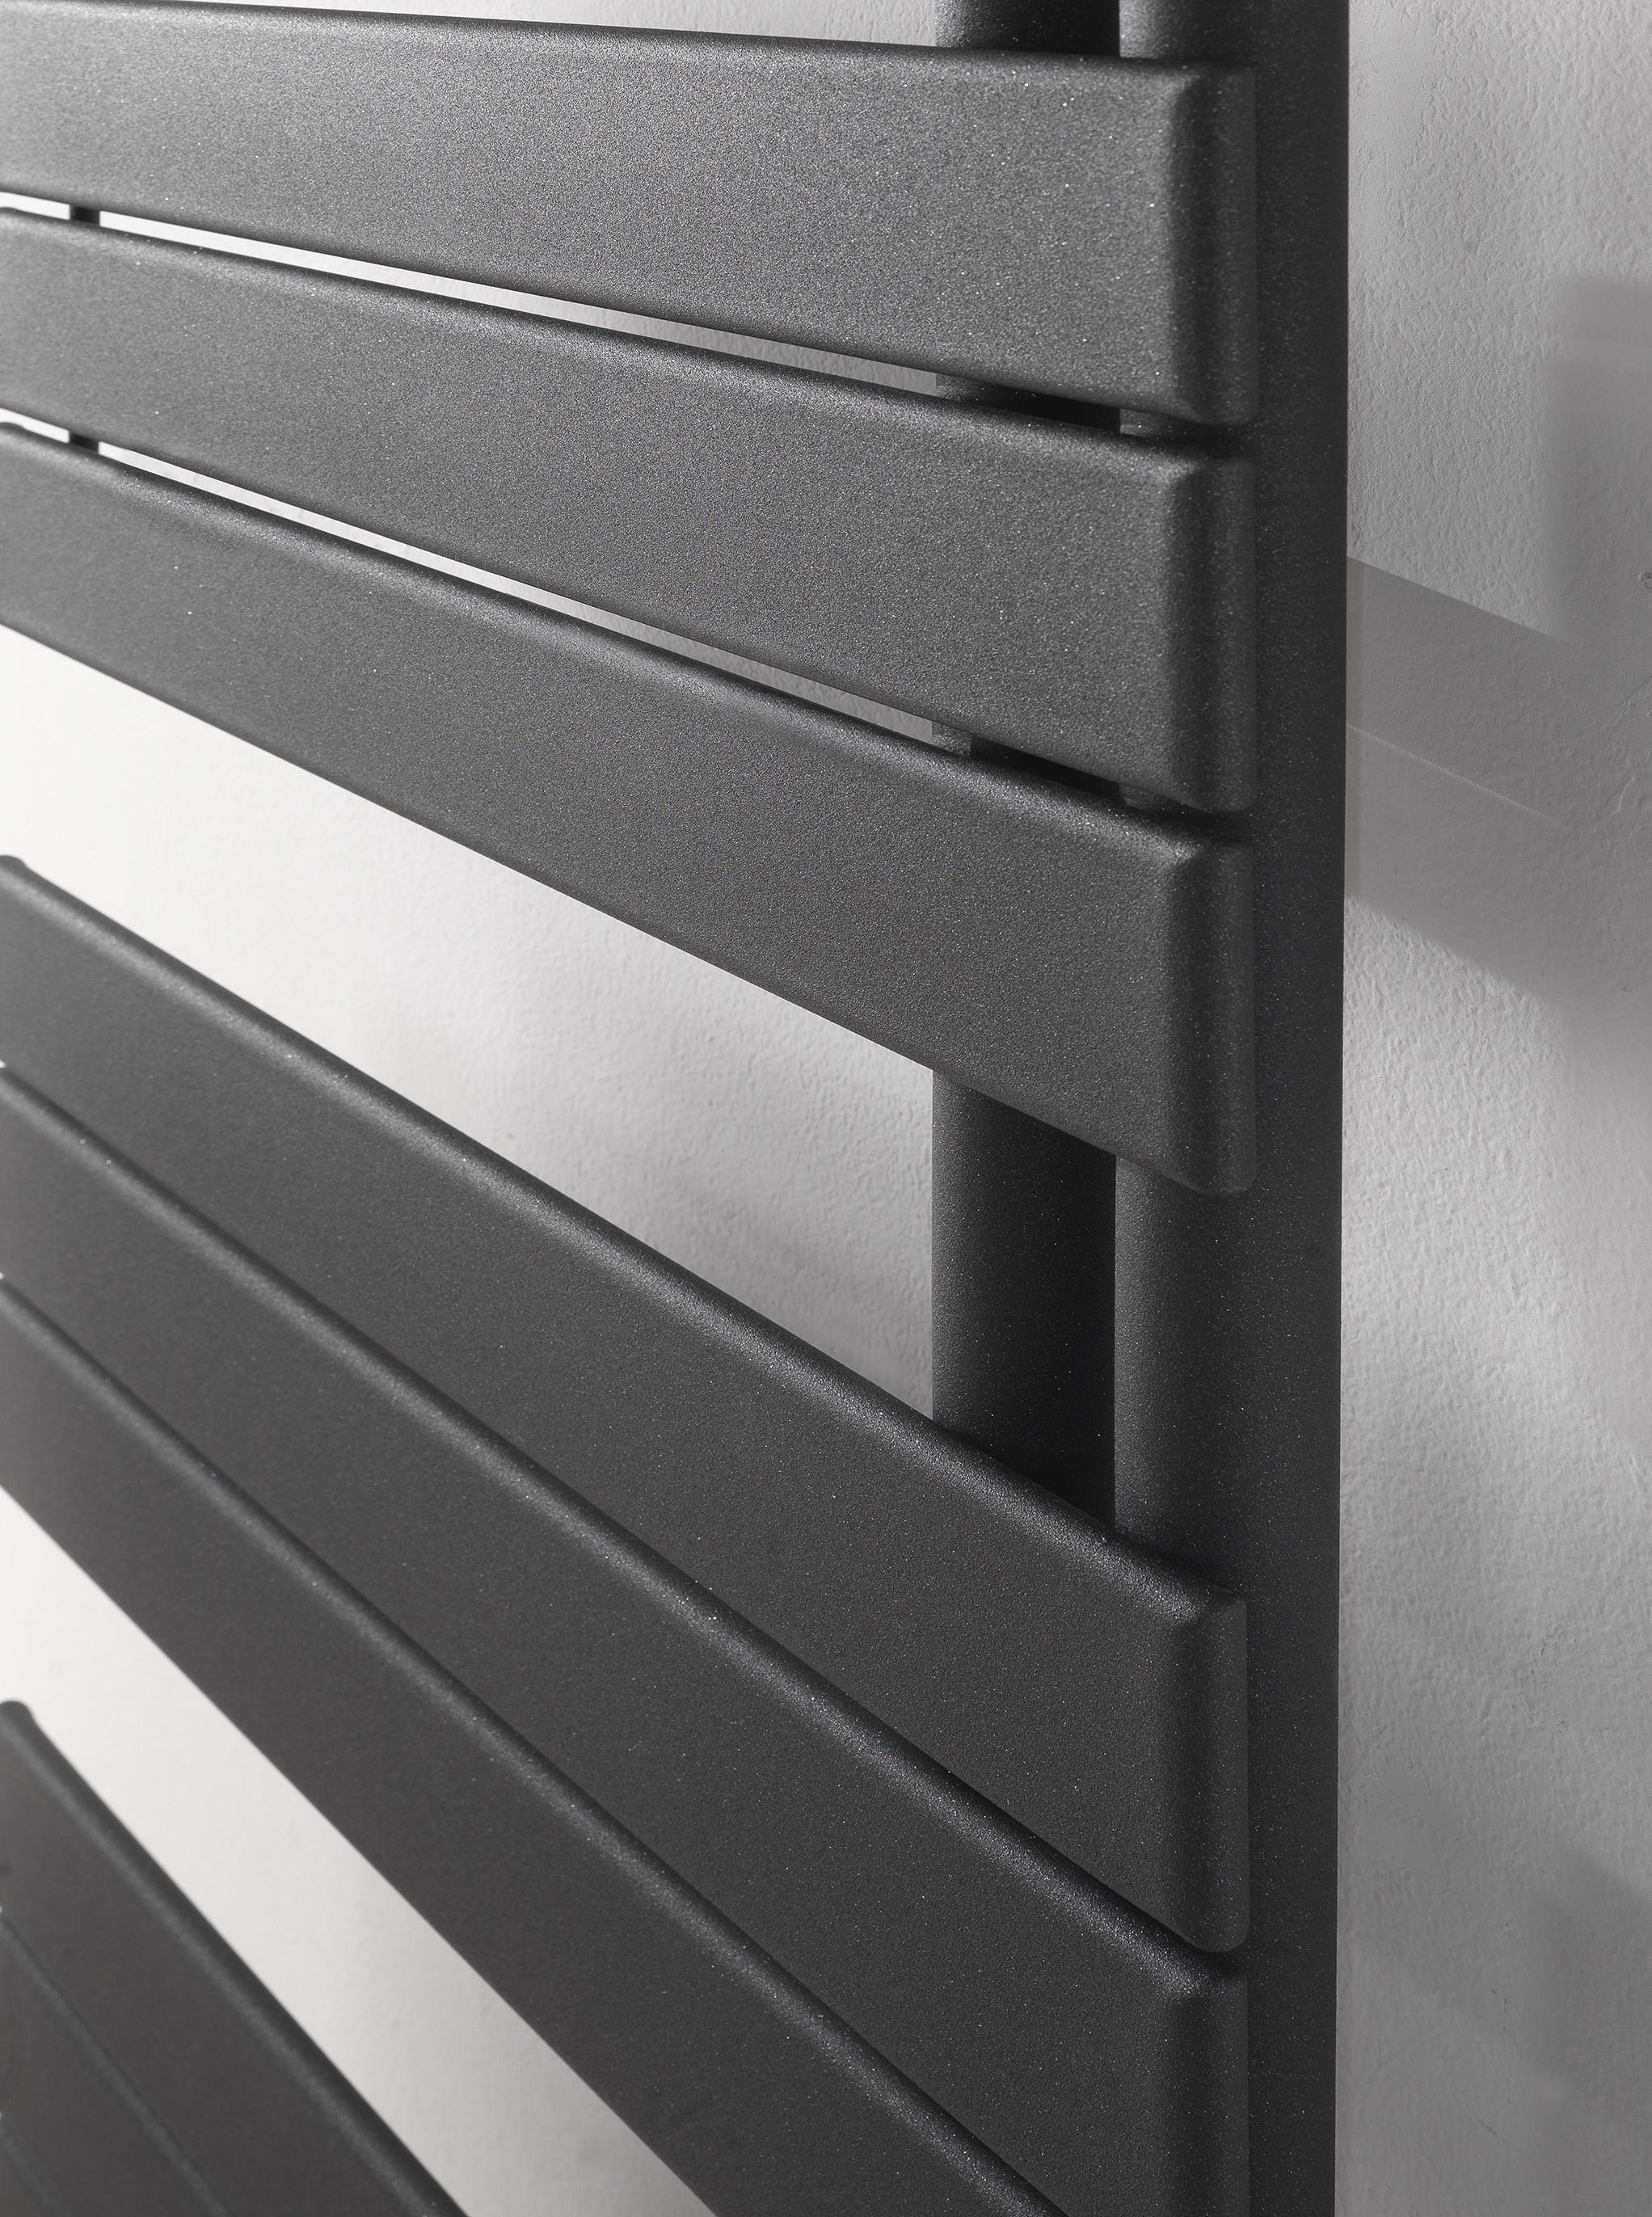 flag radiateurs de deltacalor architonic. Black Bedroom Furniture Sets. Home Design Ideas